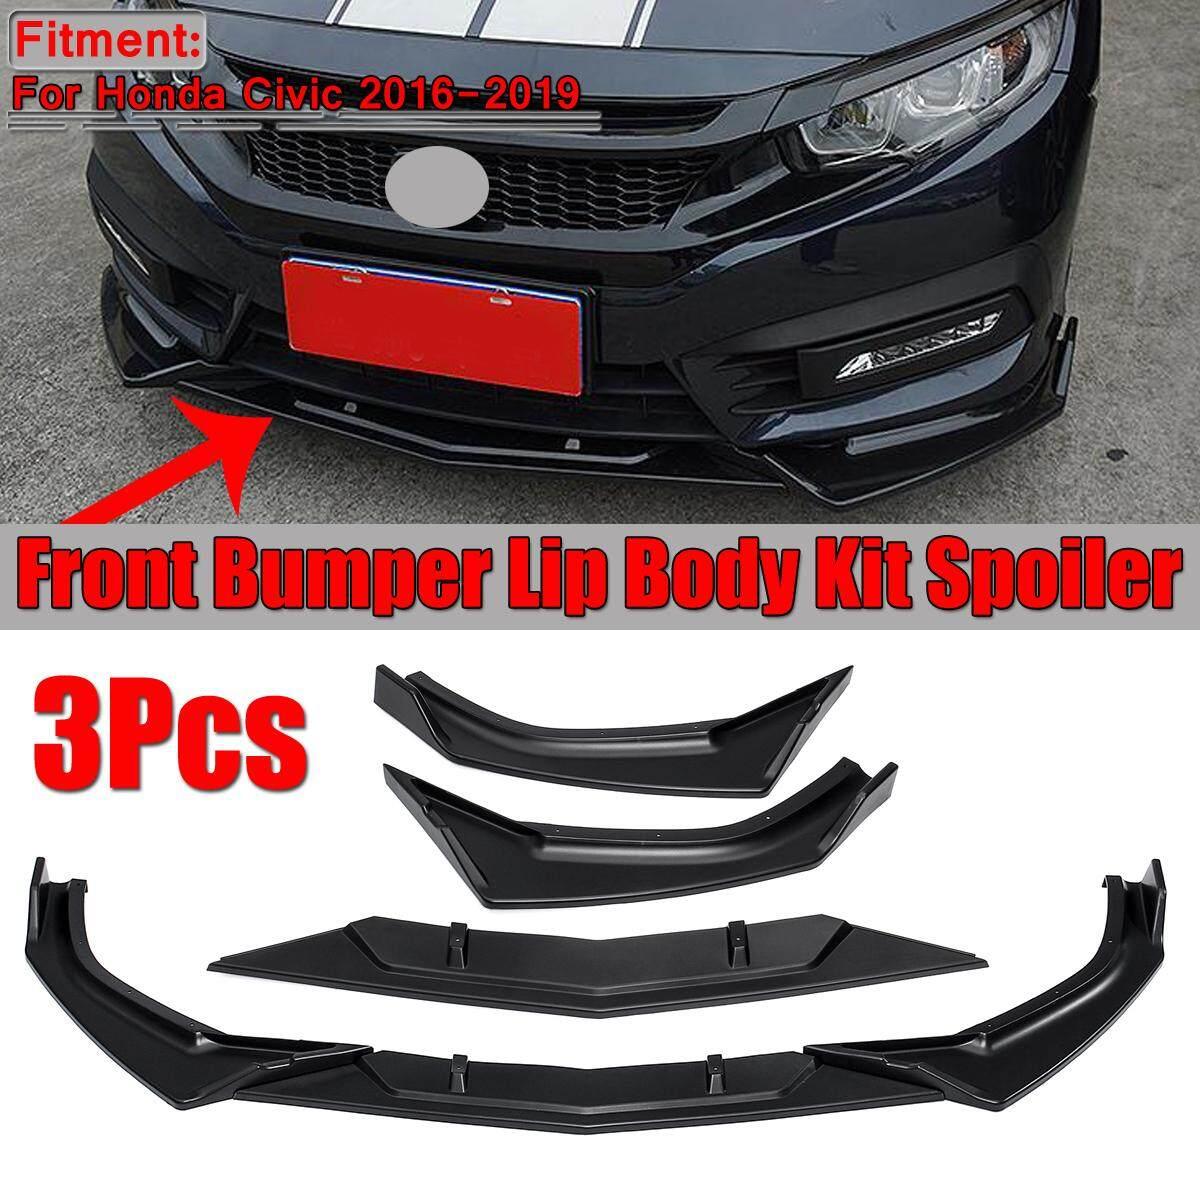 3x Front Bumper Chin Diffuser Lip Body Kit For Honda Civic 2016-2018 Gloss Black